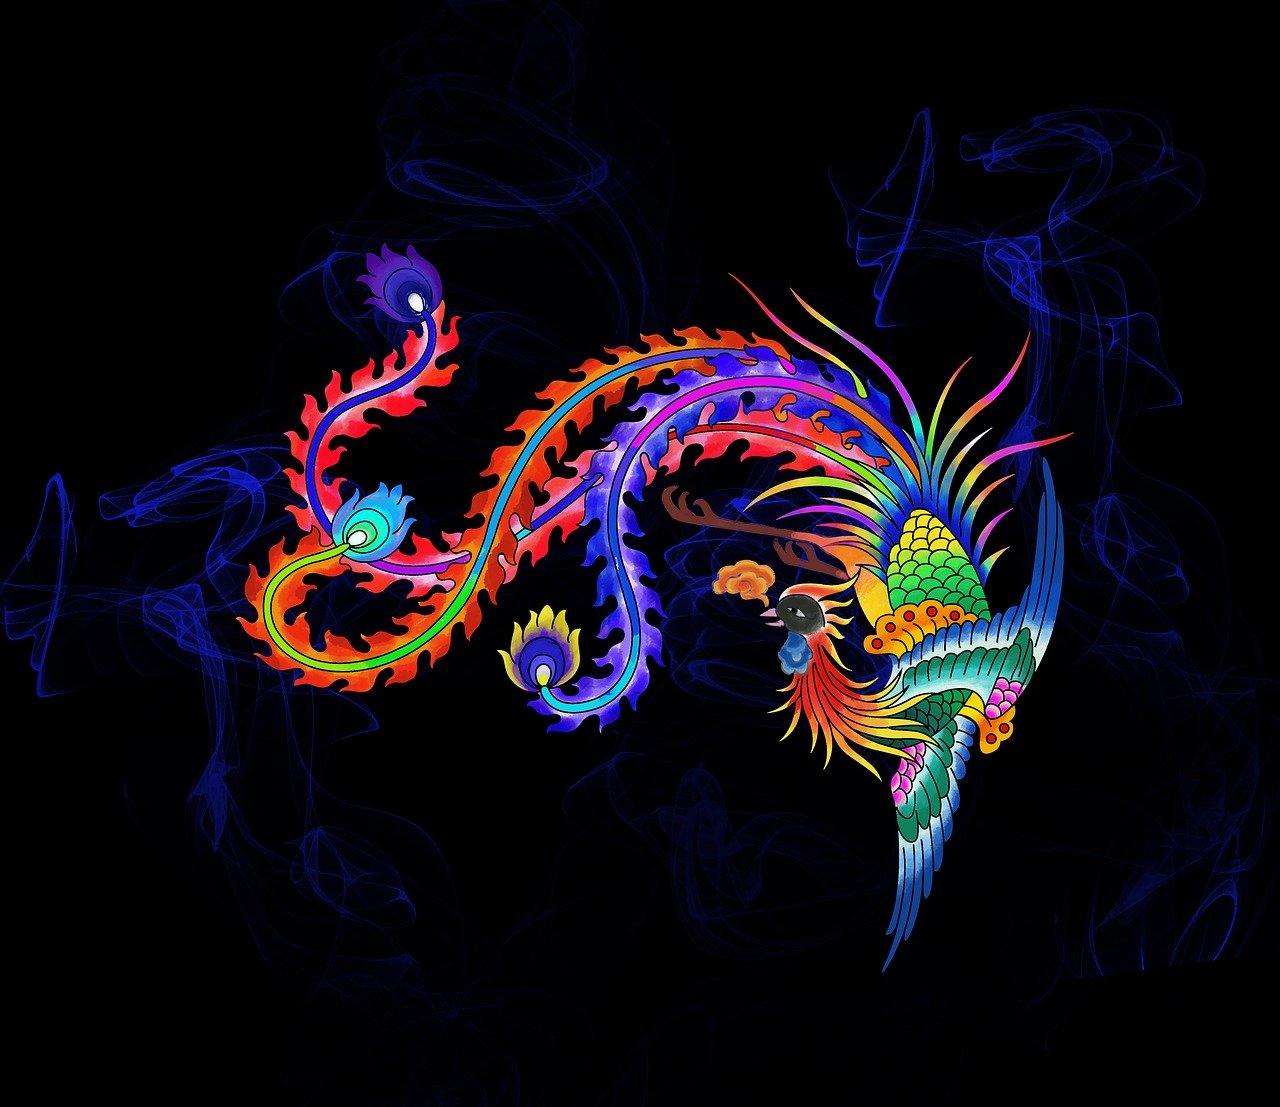 Animal Spirit Guide Meaning & Interpretation: The Phoenix